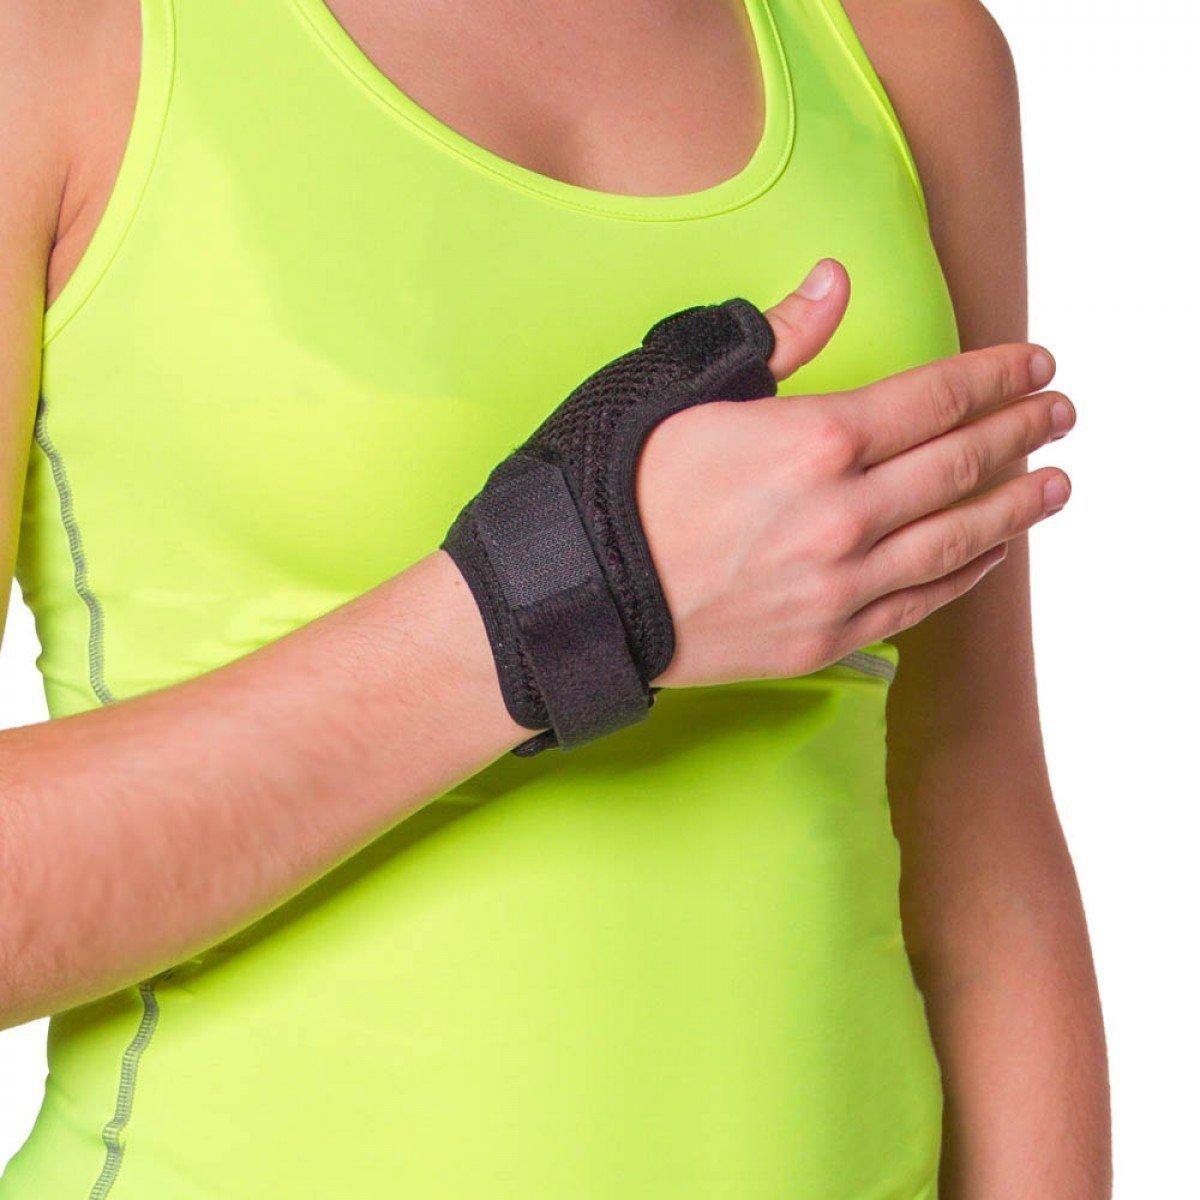 Amazon.com: Bort 112710 Soft Basal Thumb Arthritis Pain Brace - Medium:  Health & Personal Care